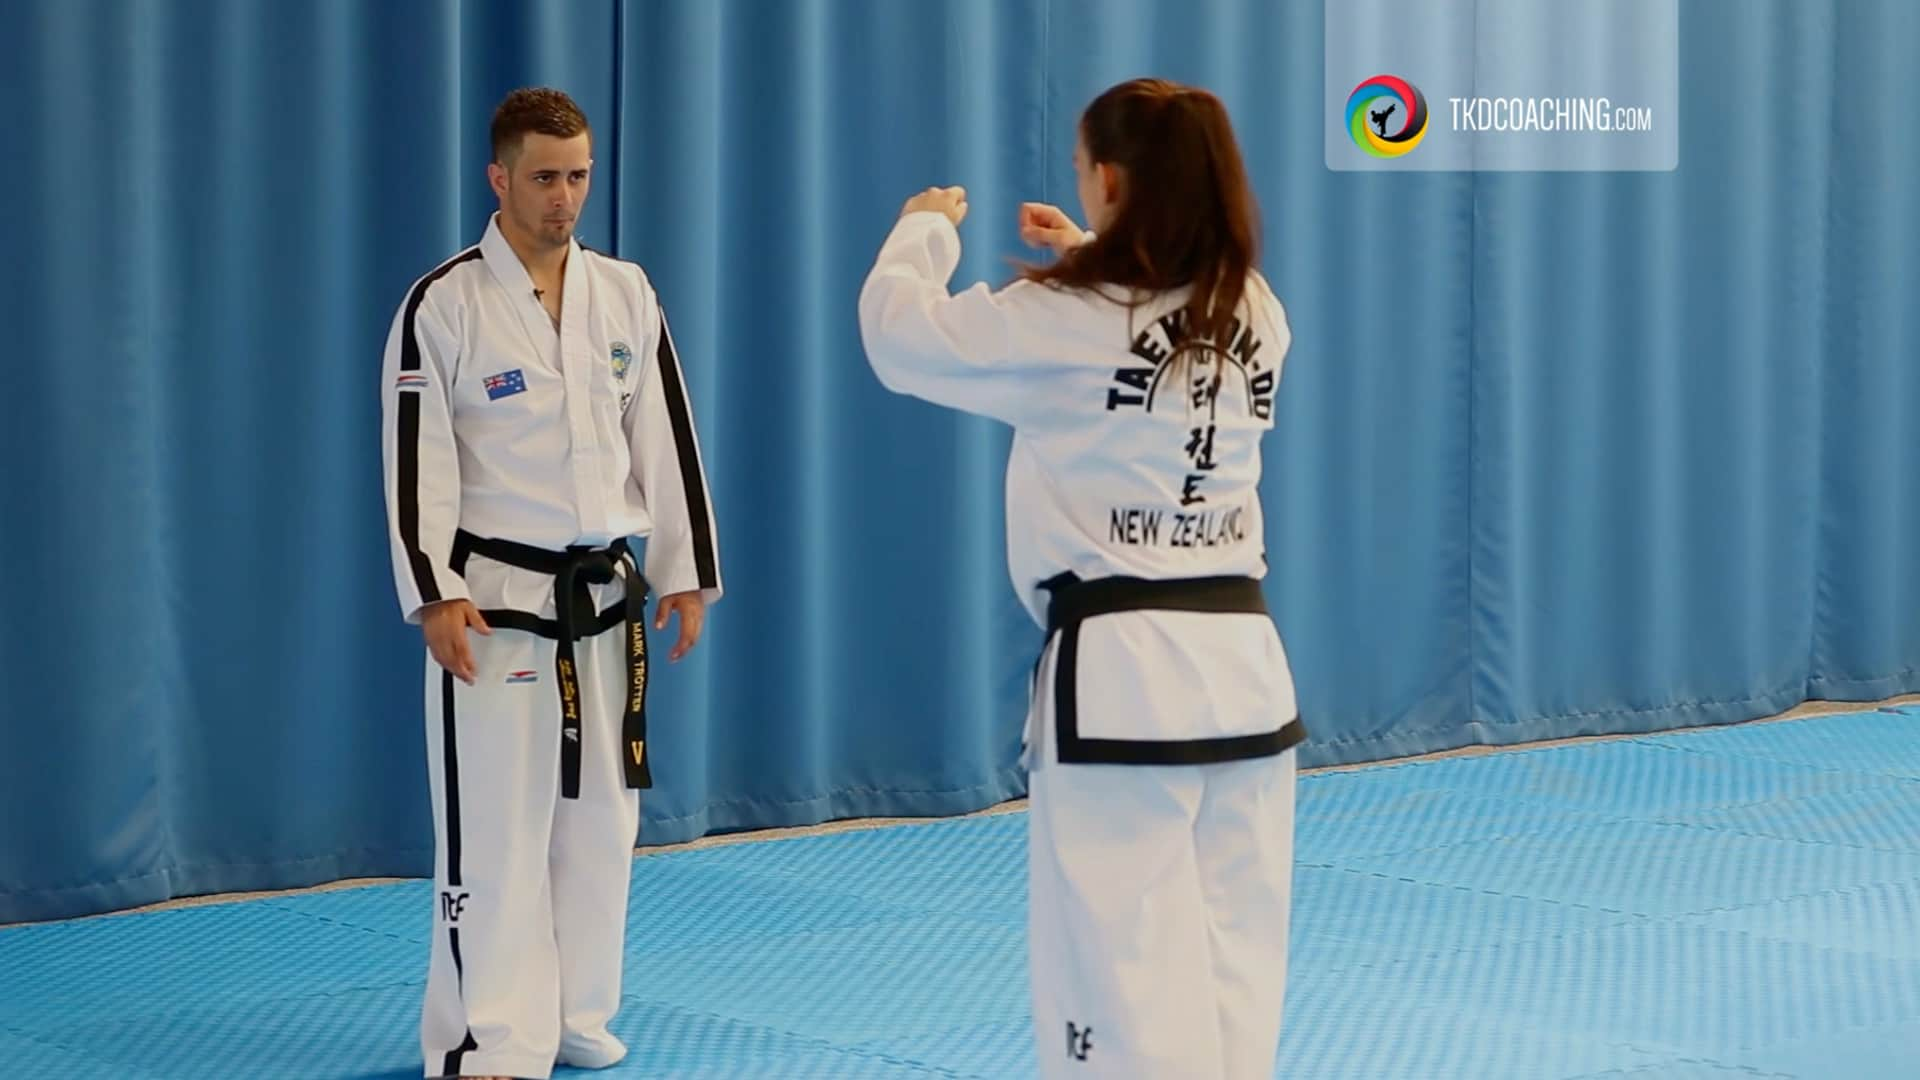 Choong-jang tul with Mark Trotter